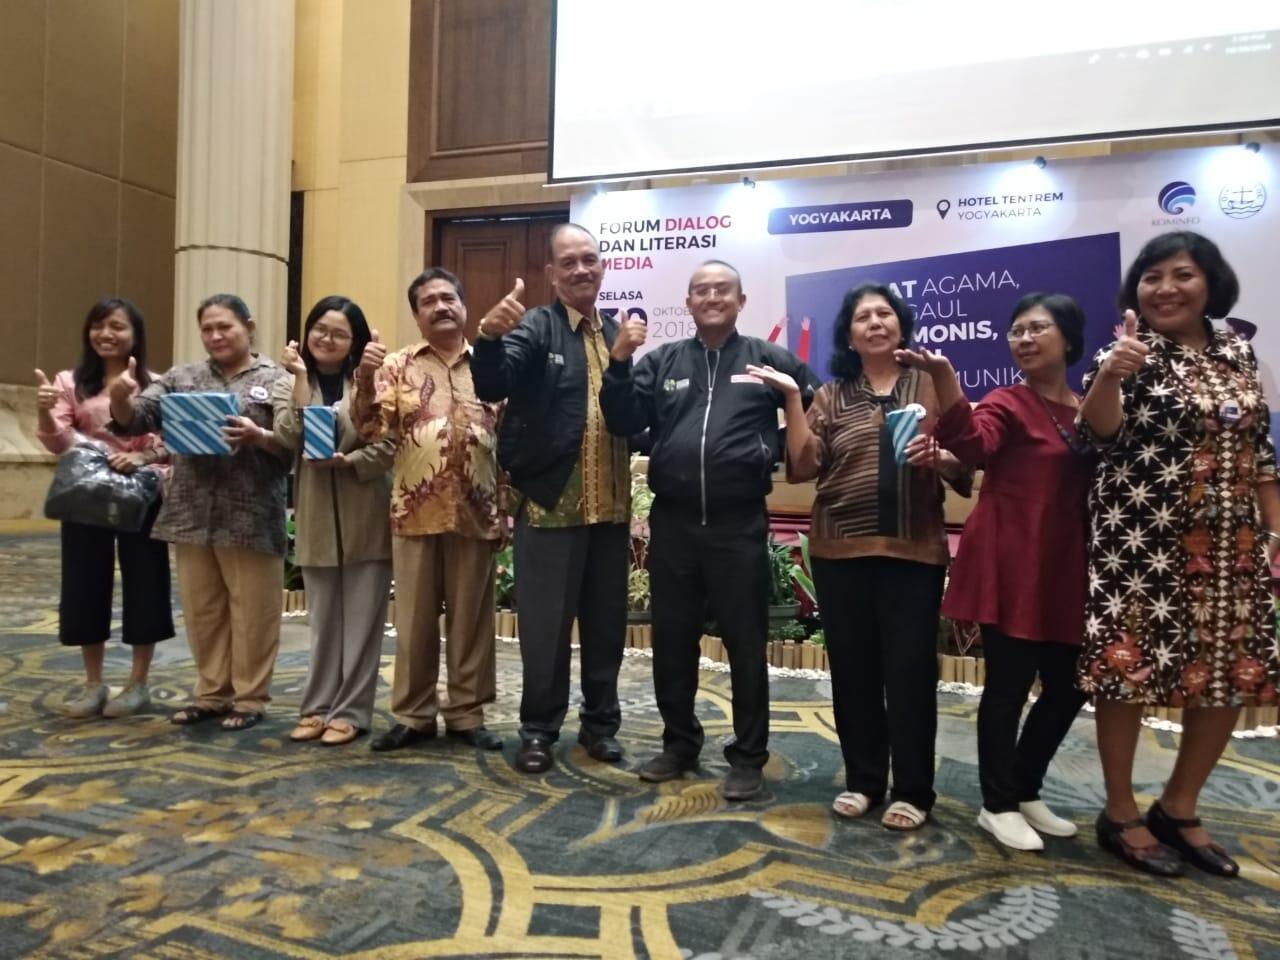 Gandeng PGI Yogyakarta, Kemkominfo Ajak Pemuda Bijak Bermedsos